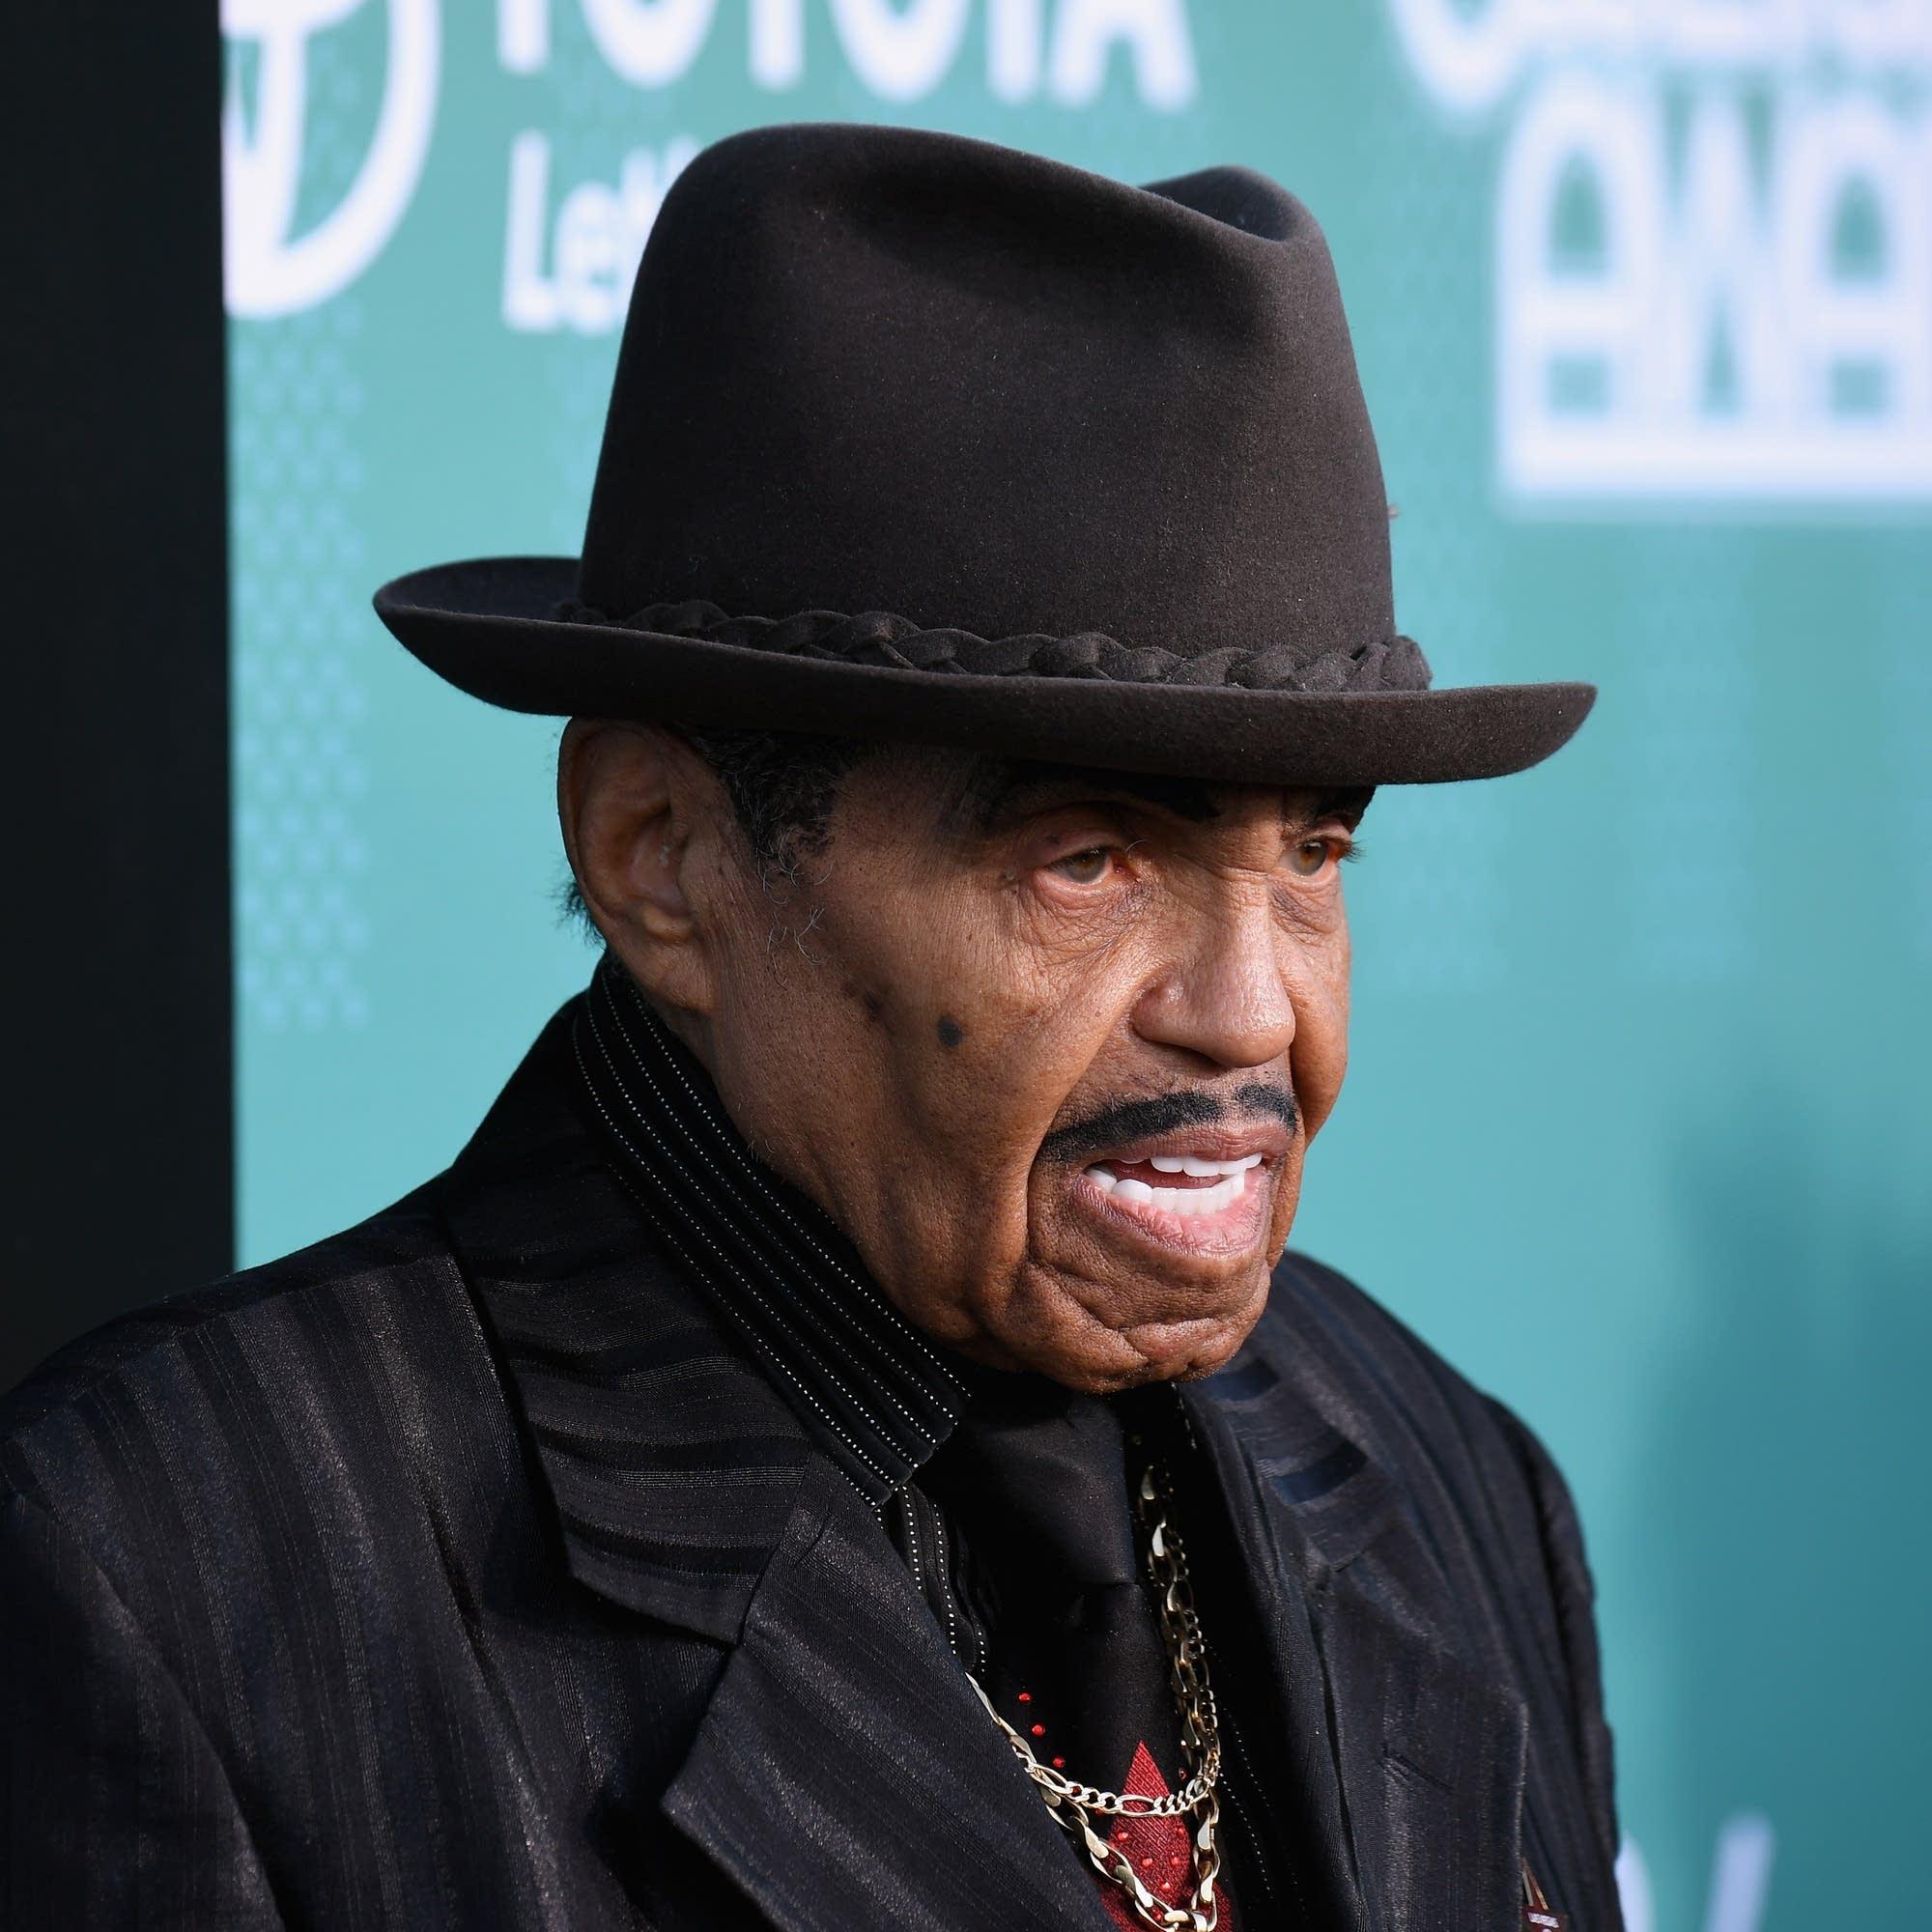 Joe Jackson at the Soul Train Awards in 2017.